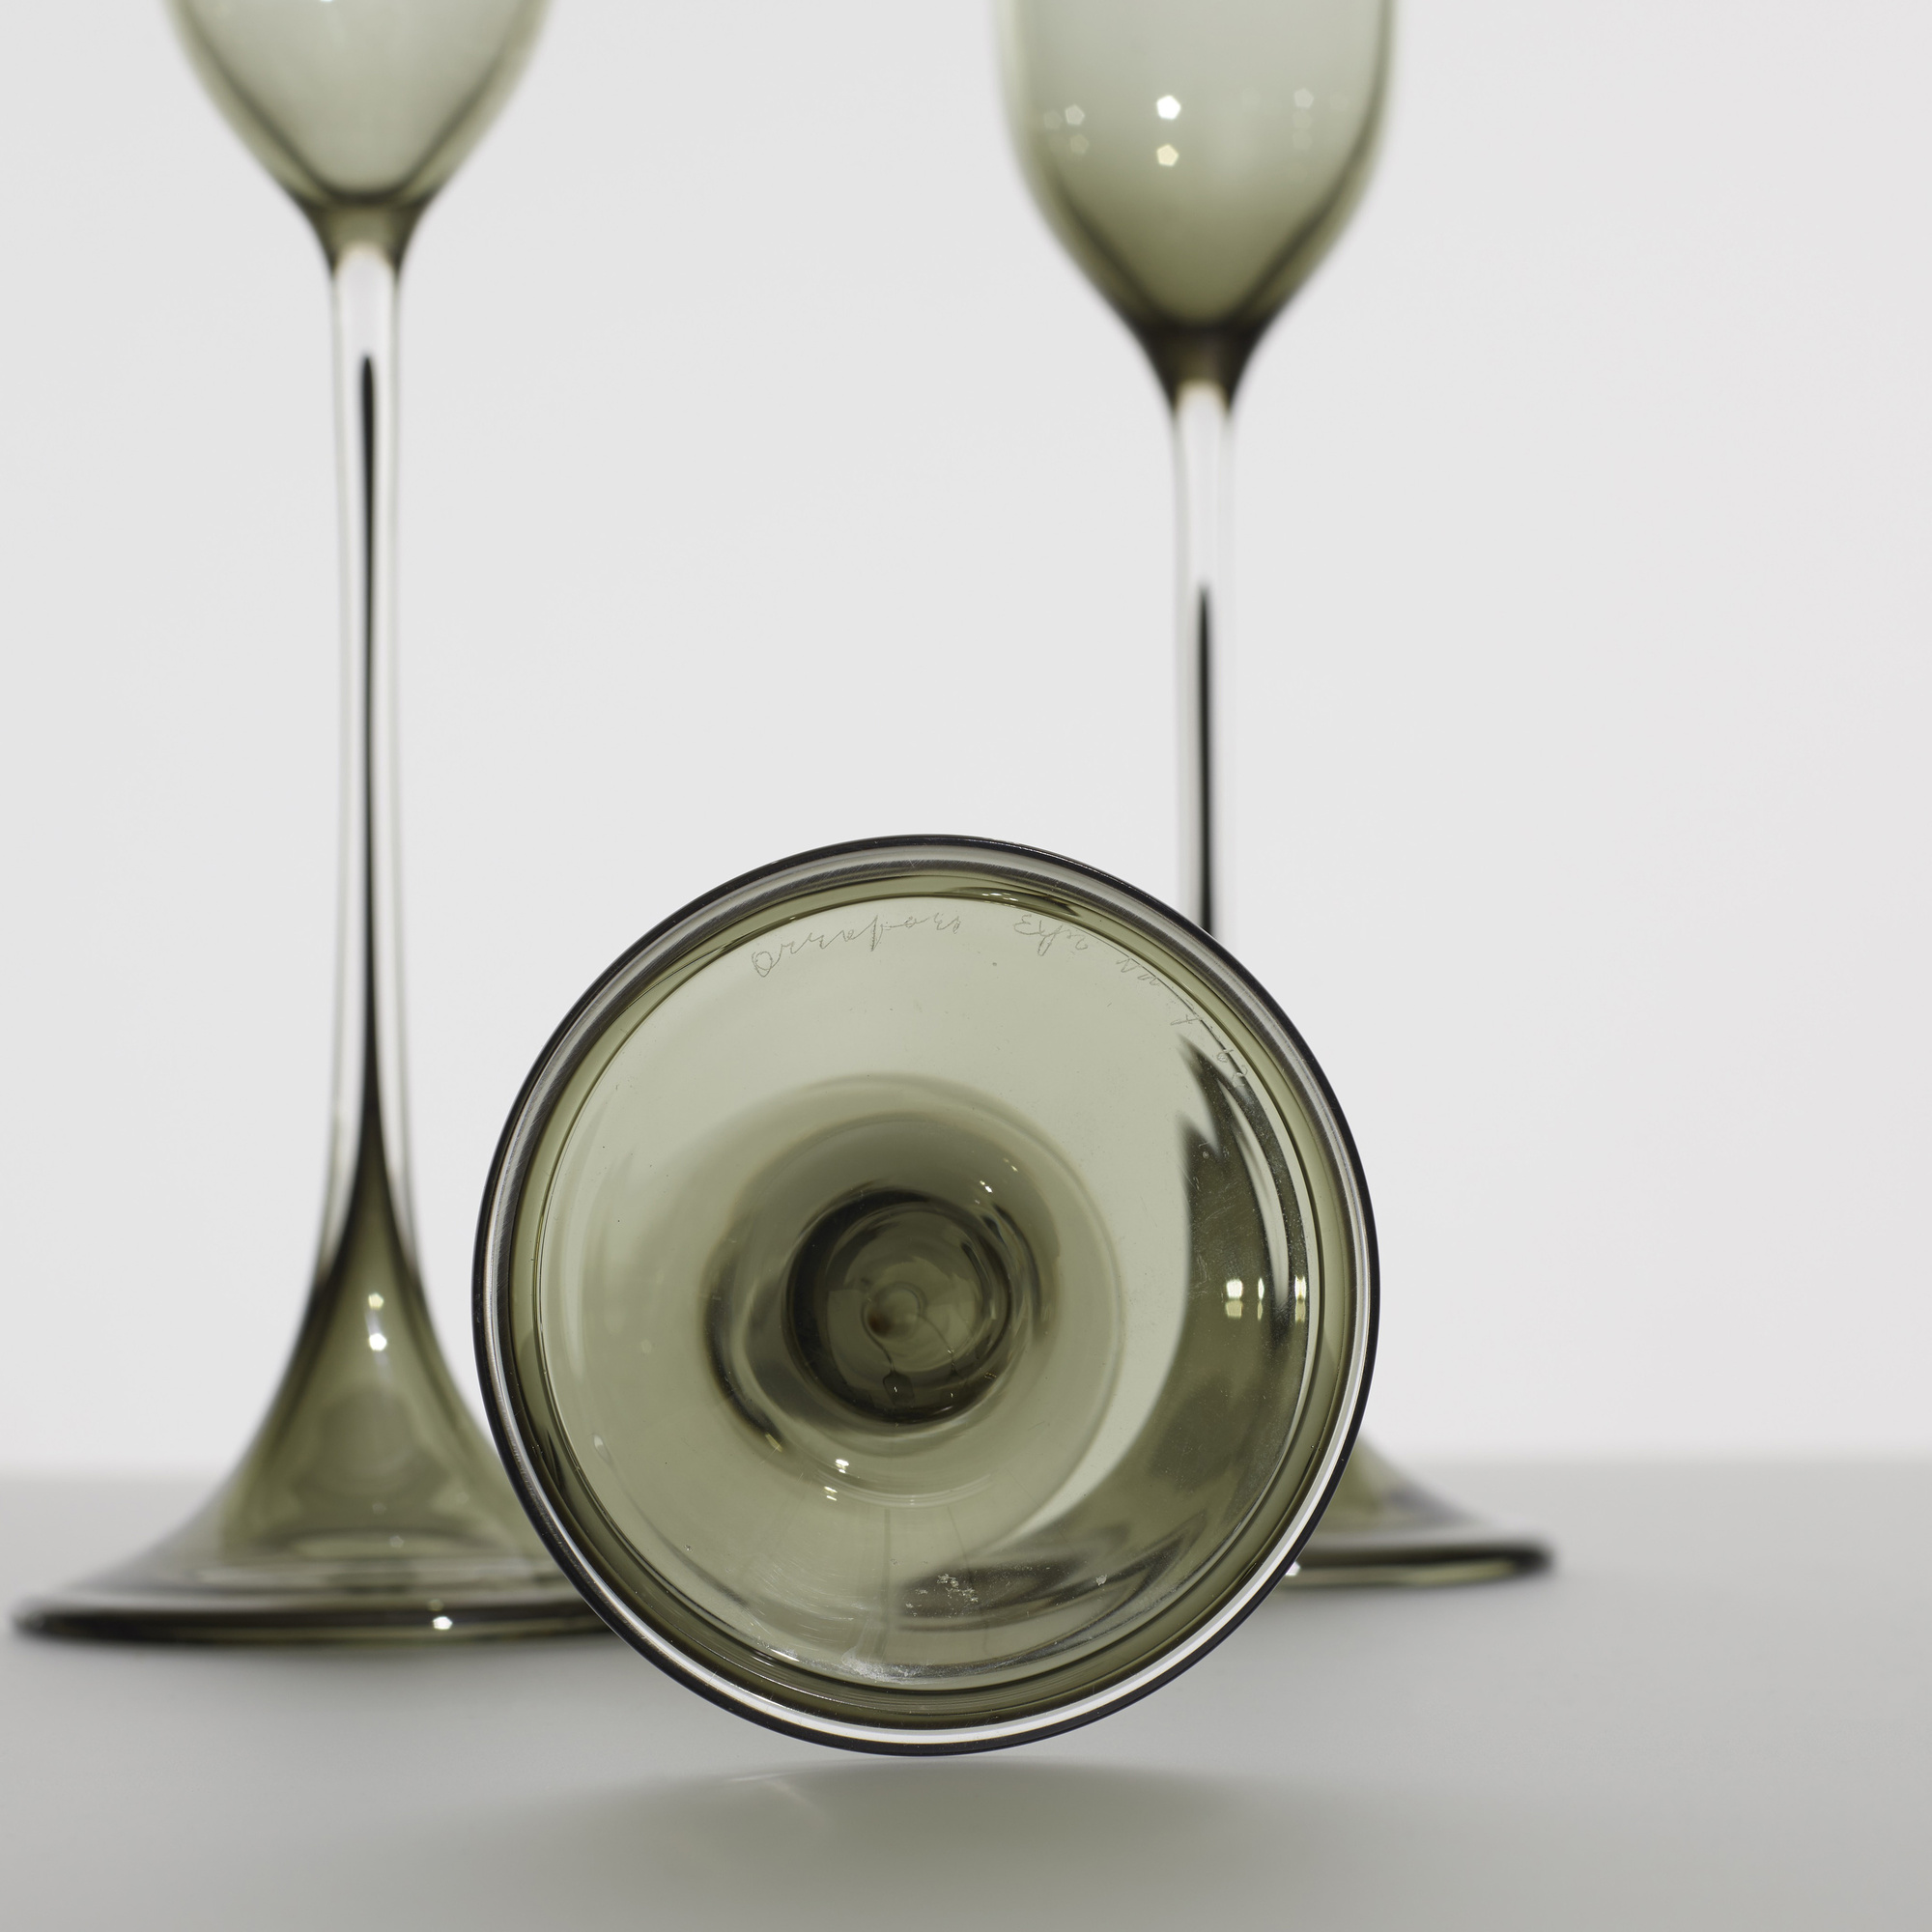 197: Nils Landberg / Tulpa glasses, set of three (2 of 2)